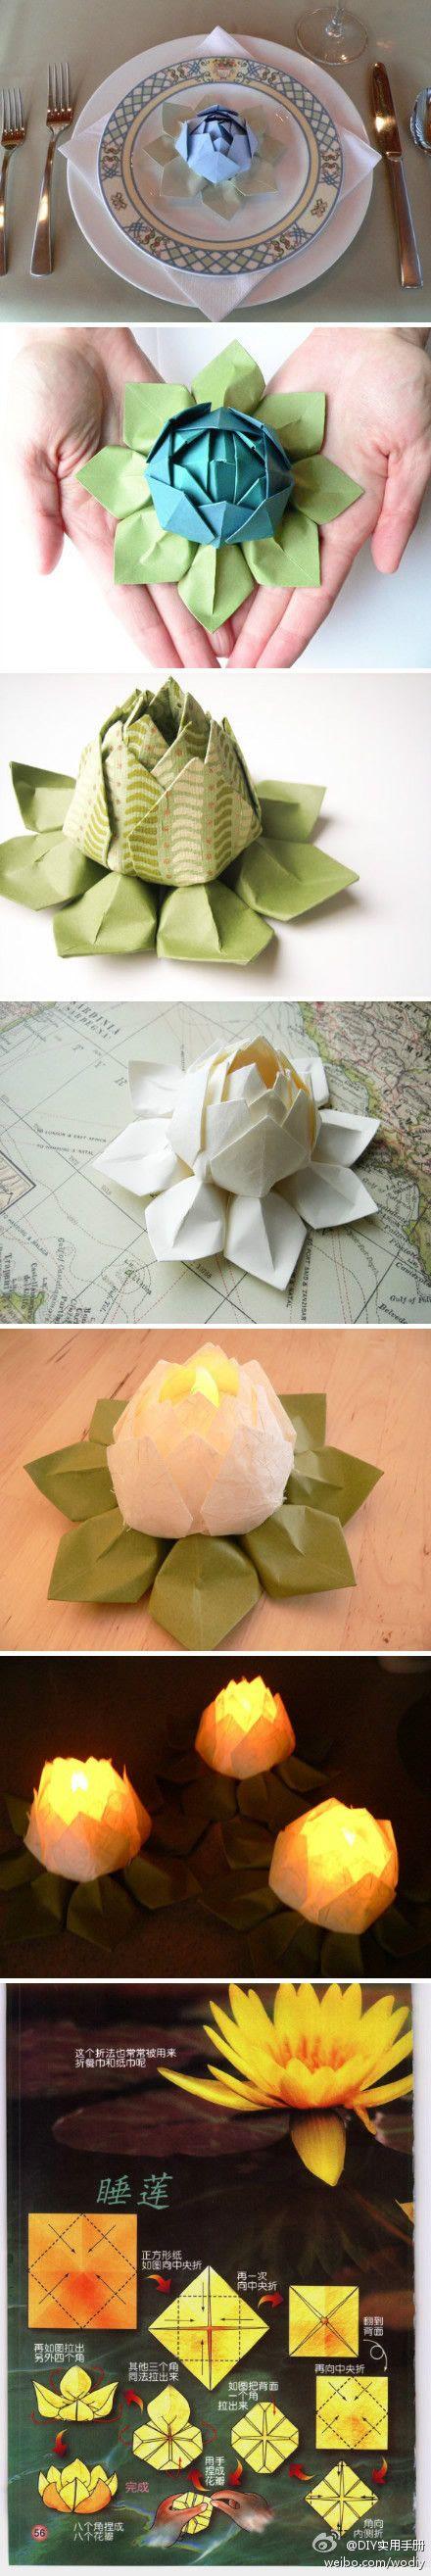 lotus #origami #paper #crafts #DIY #creative #cards